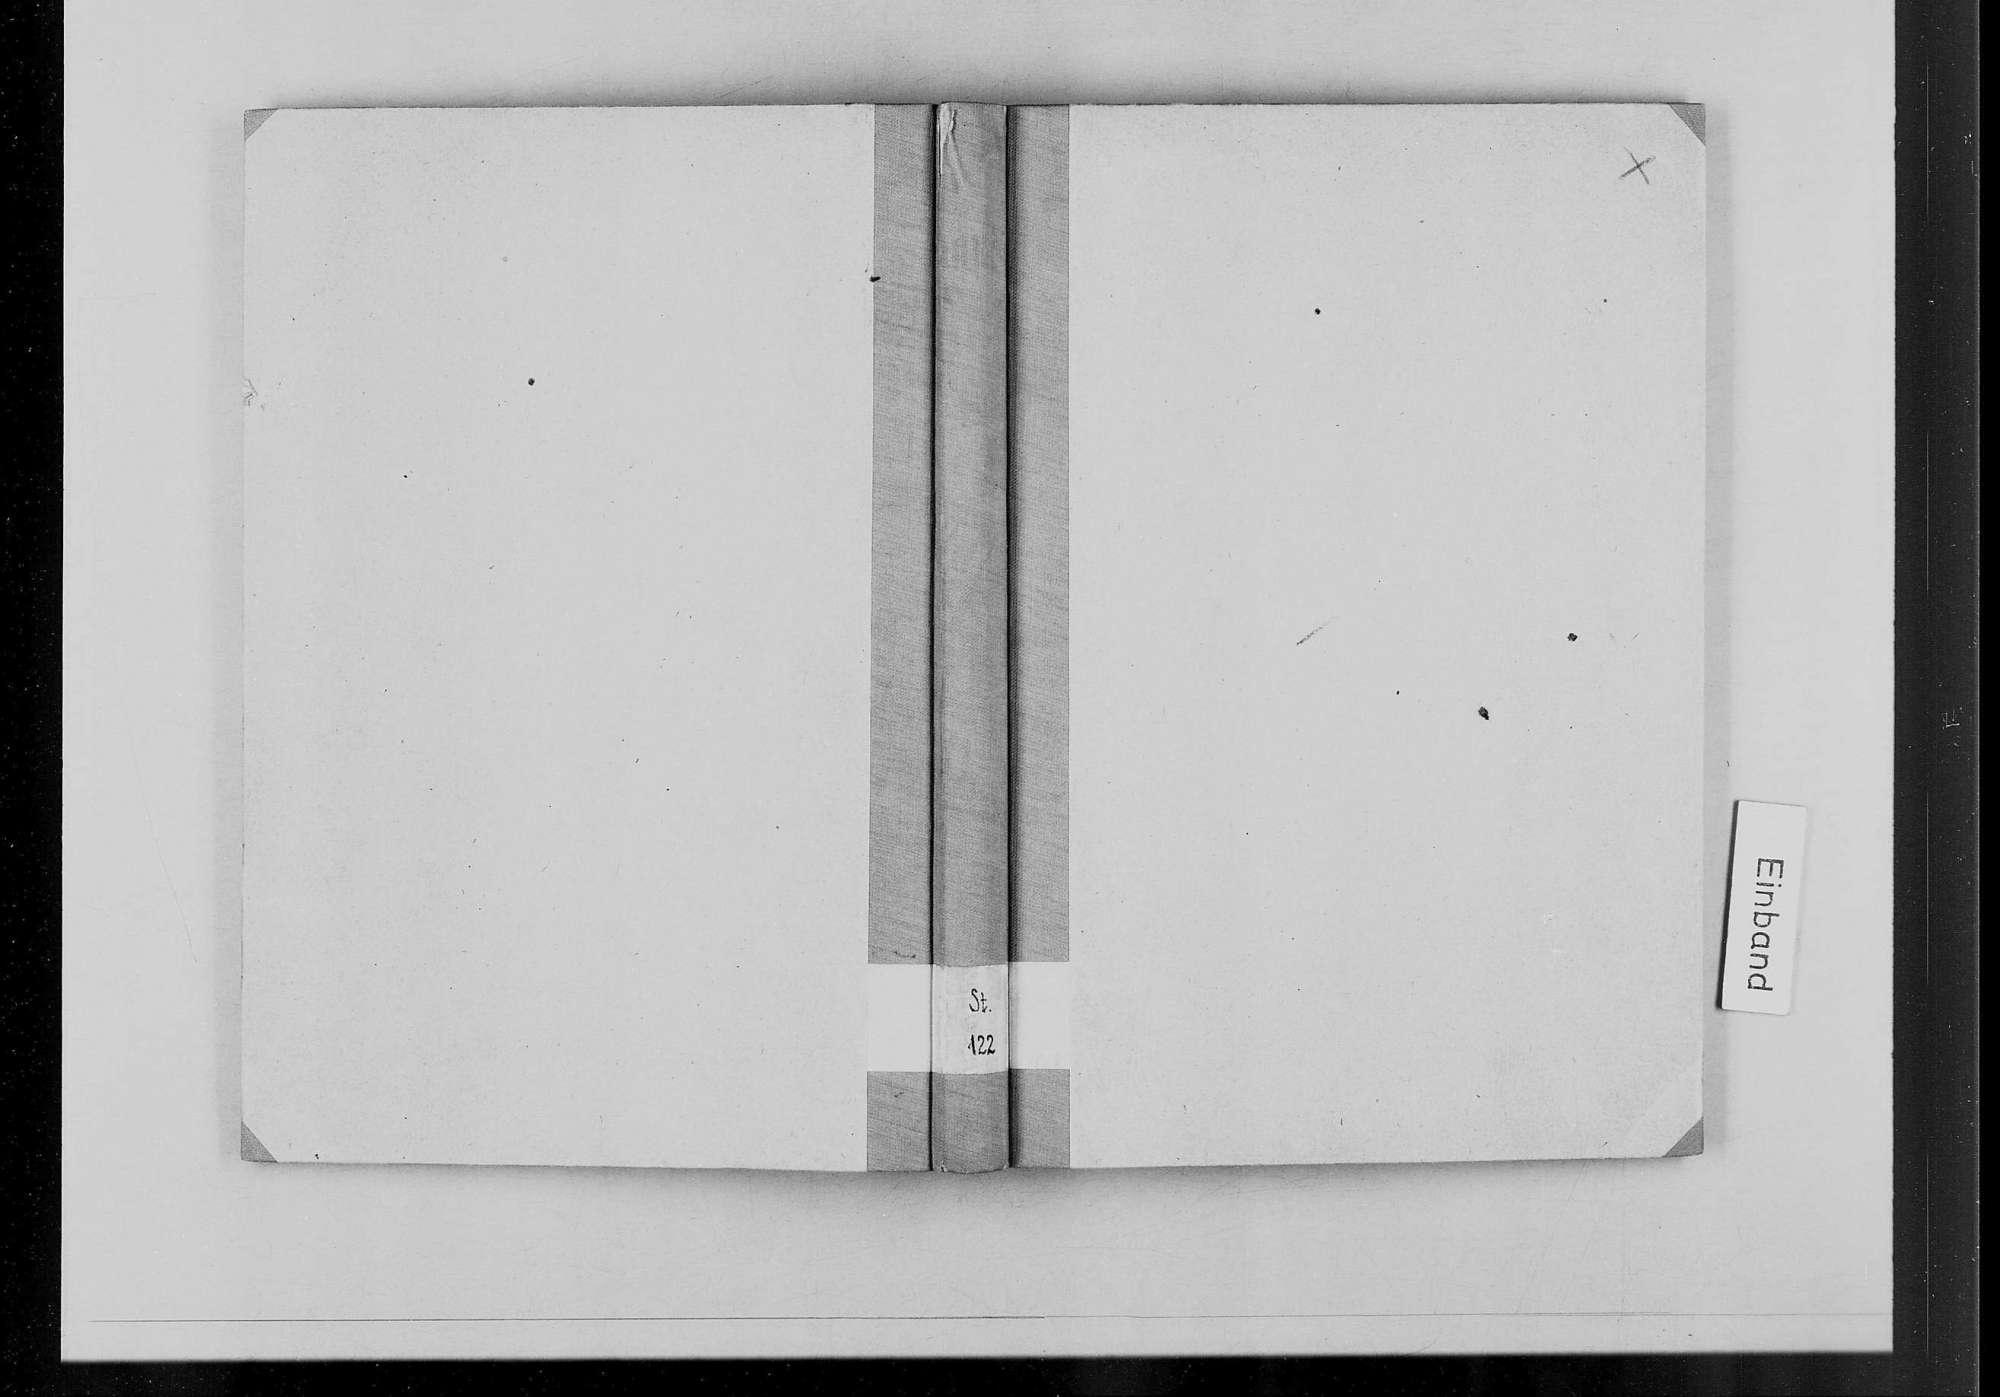 Backnang, Bild 1